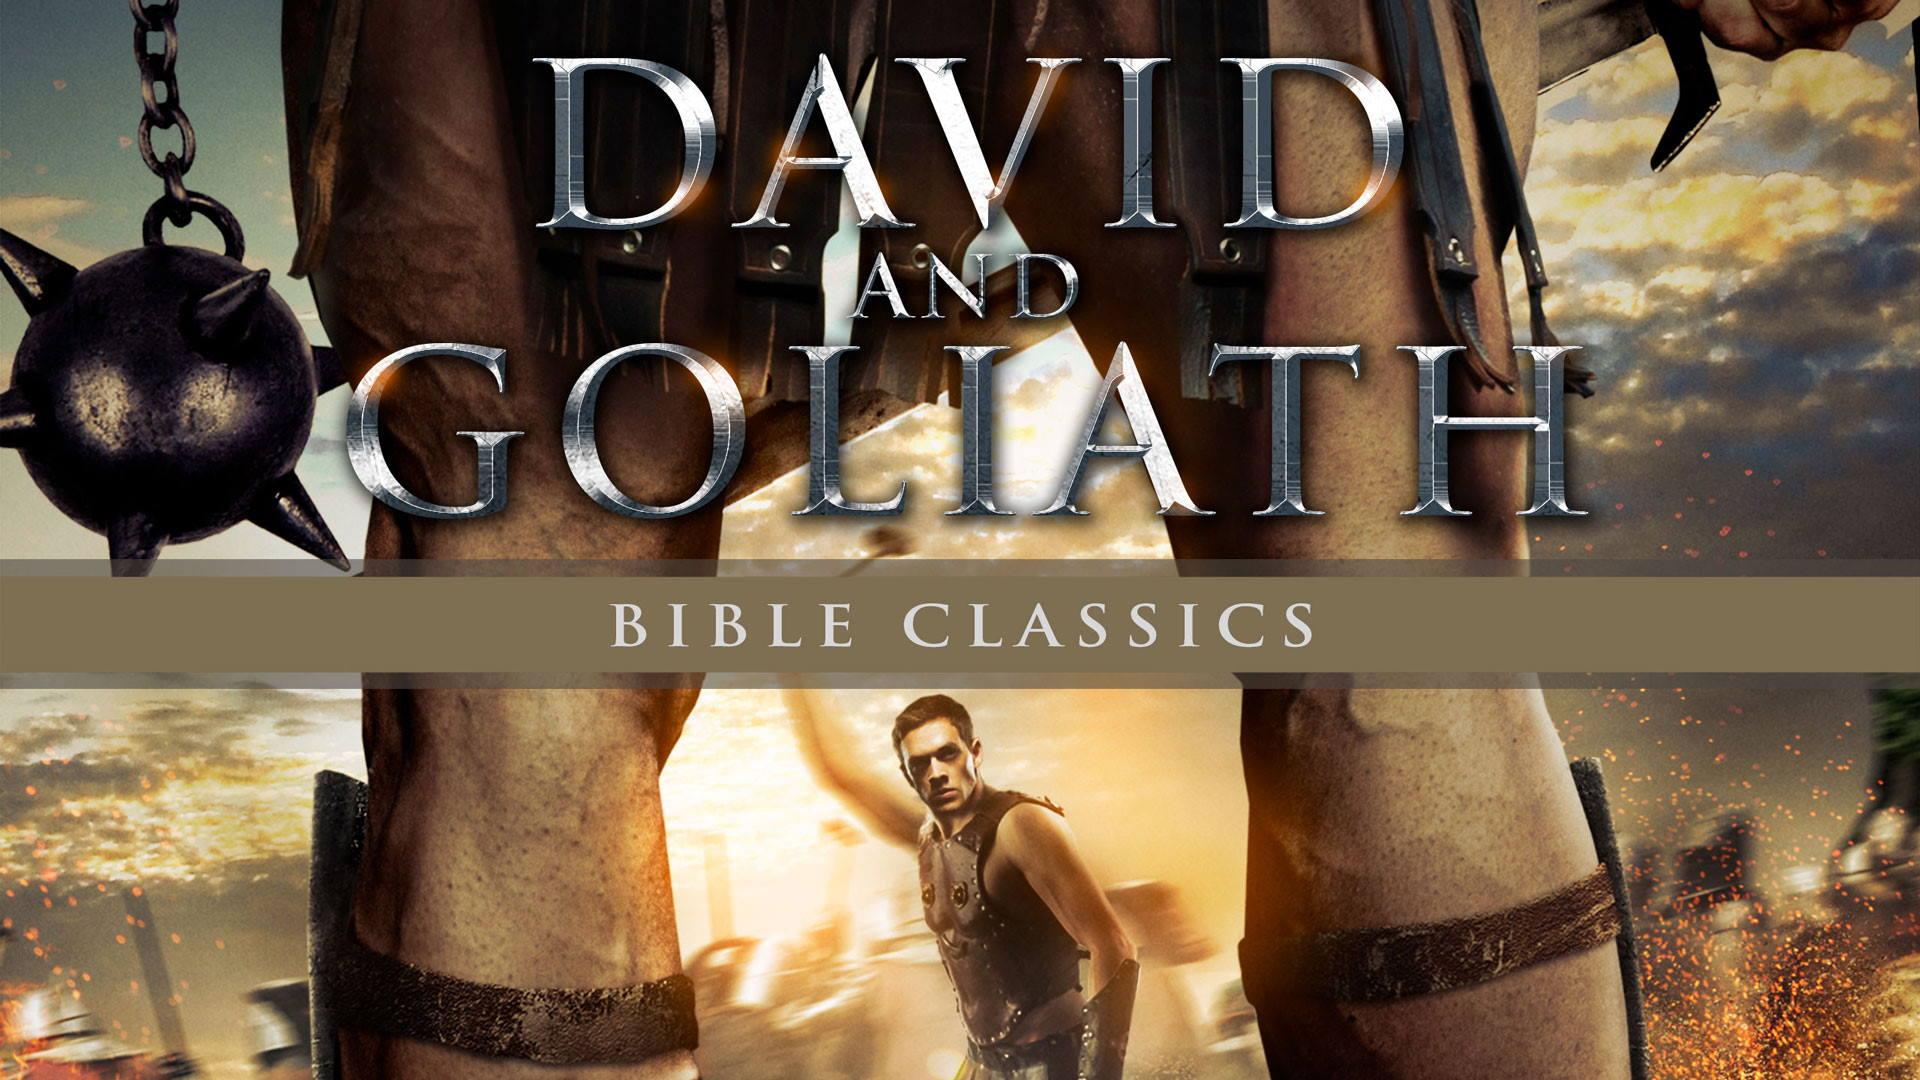 David And Goliath: Bible Classics